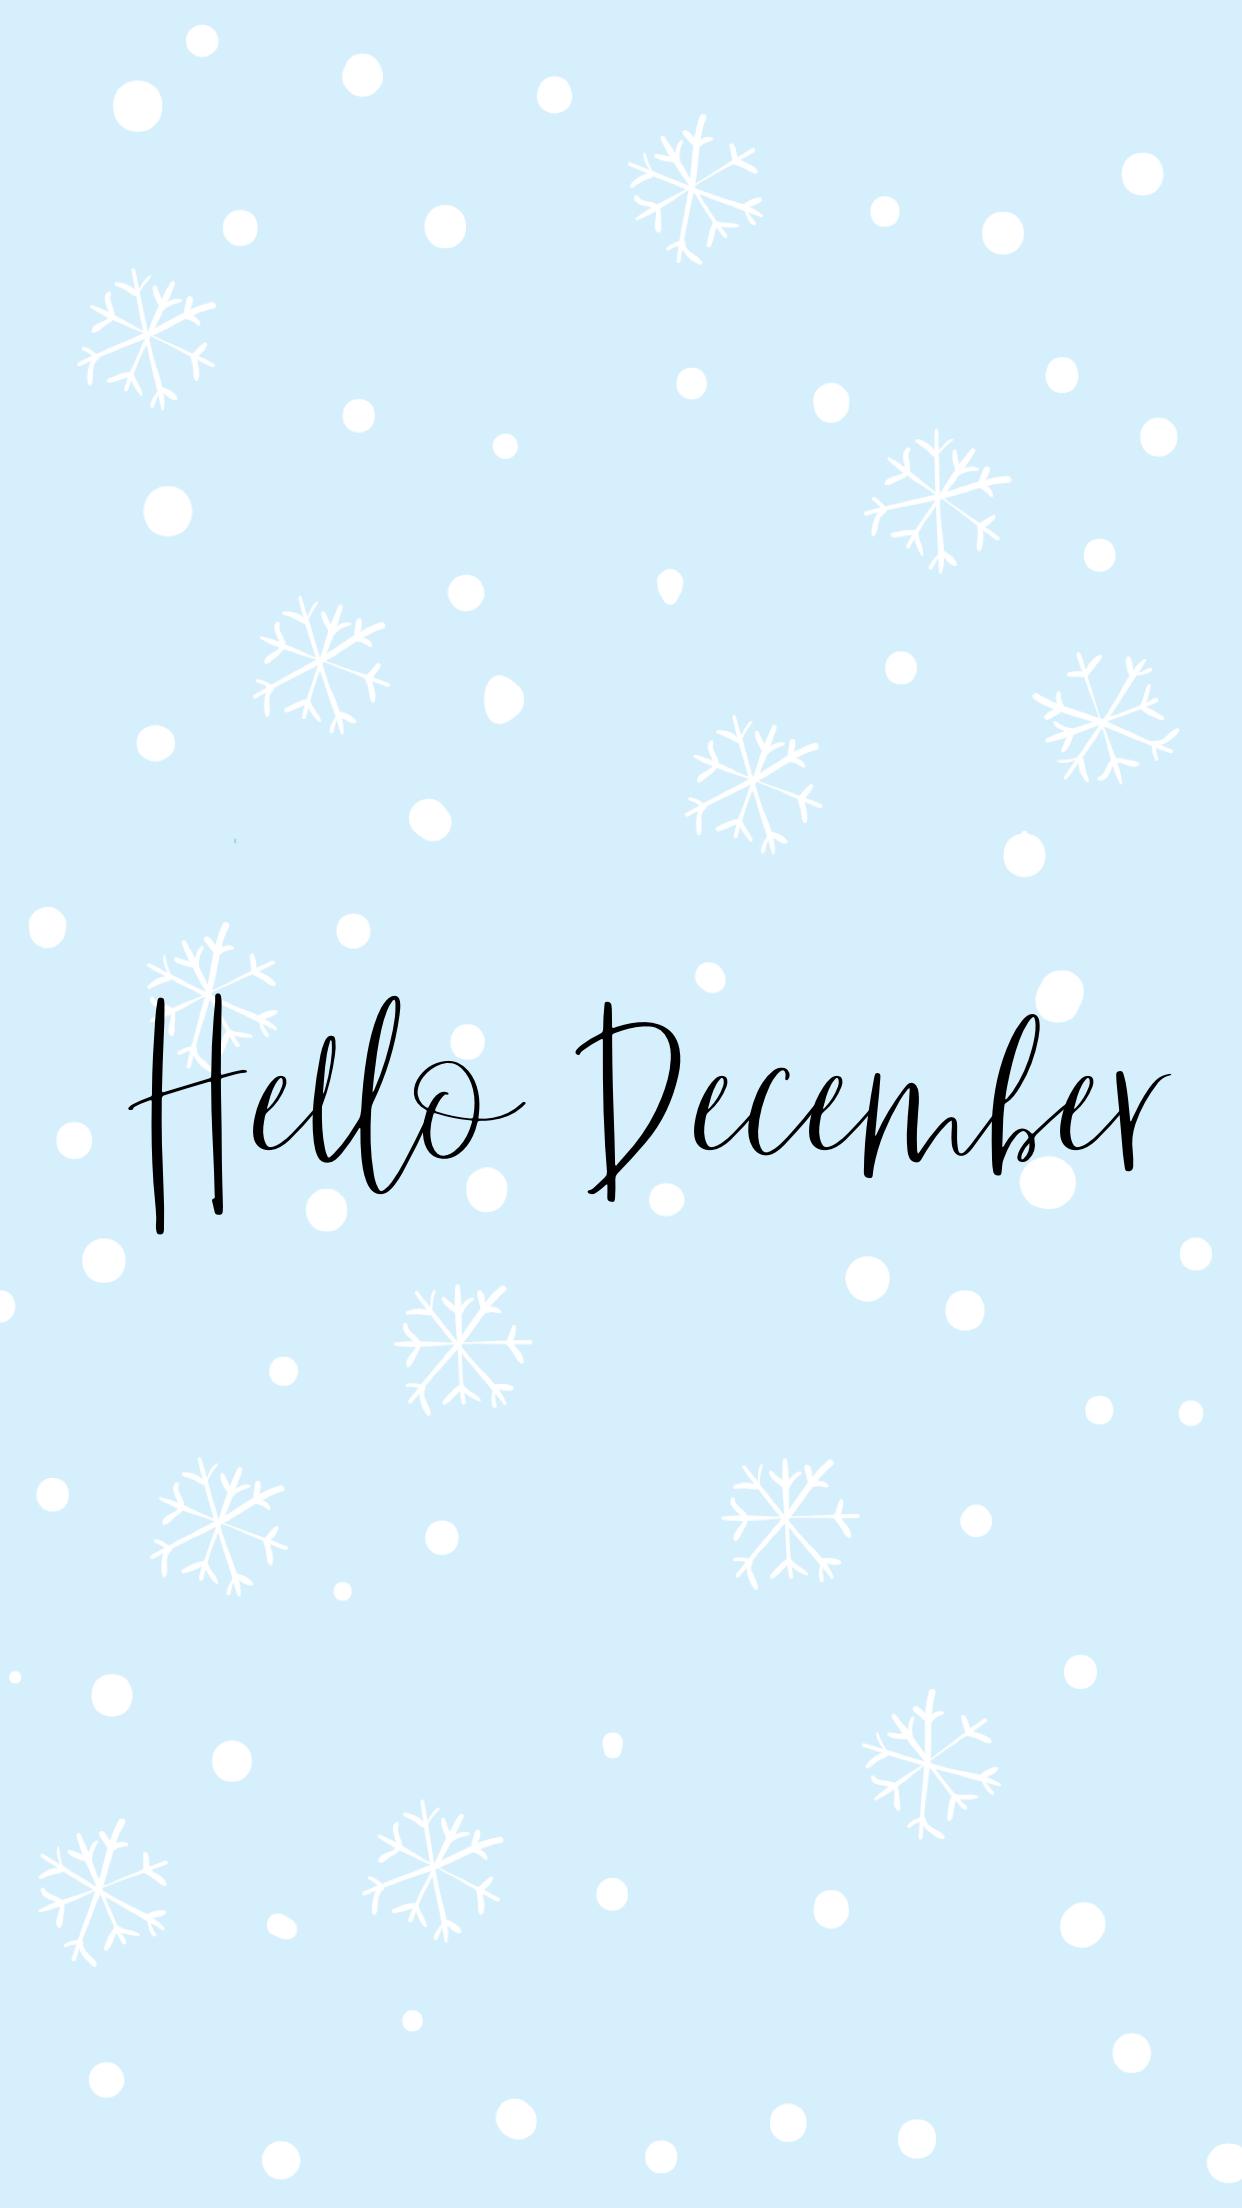 happy december instagram story